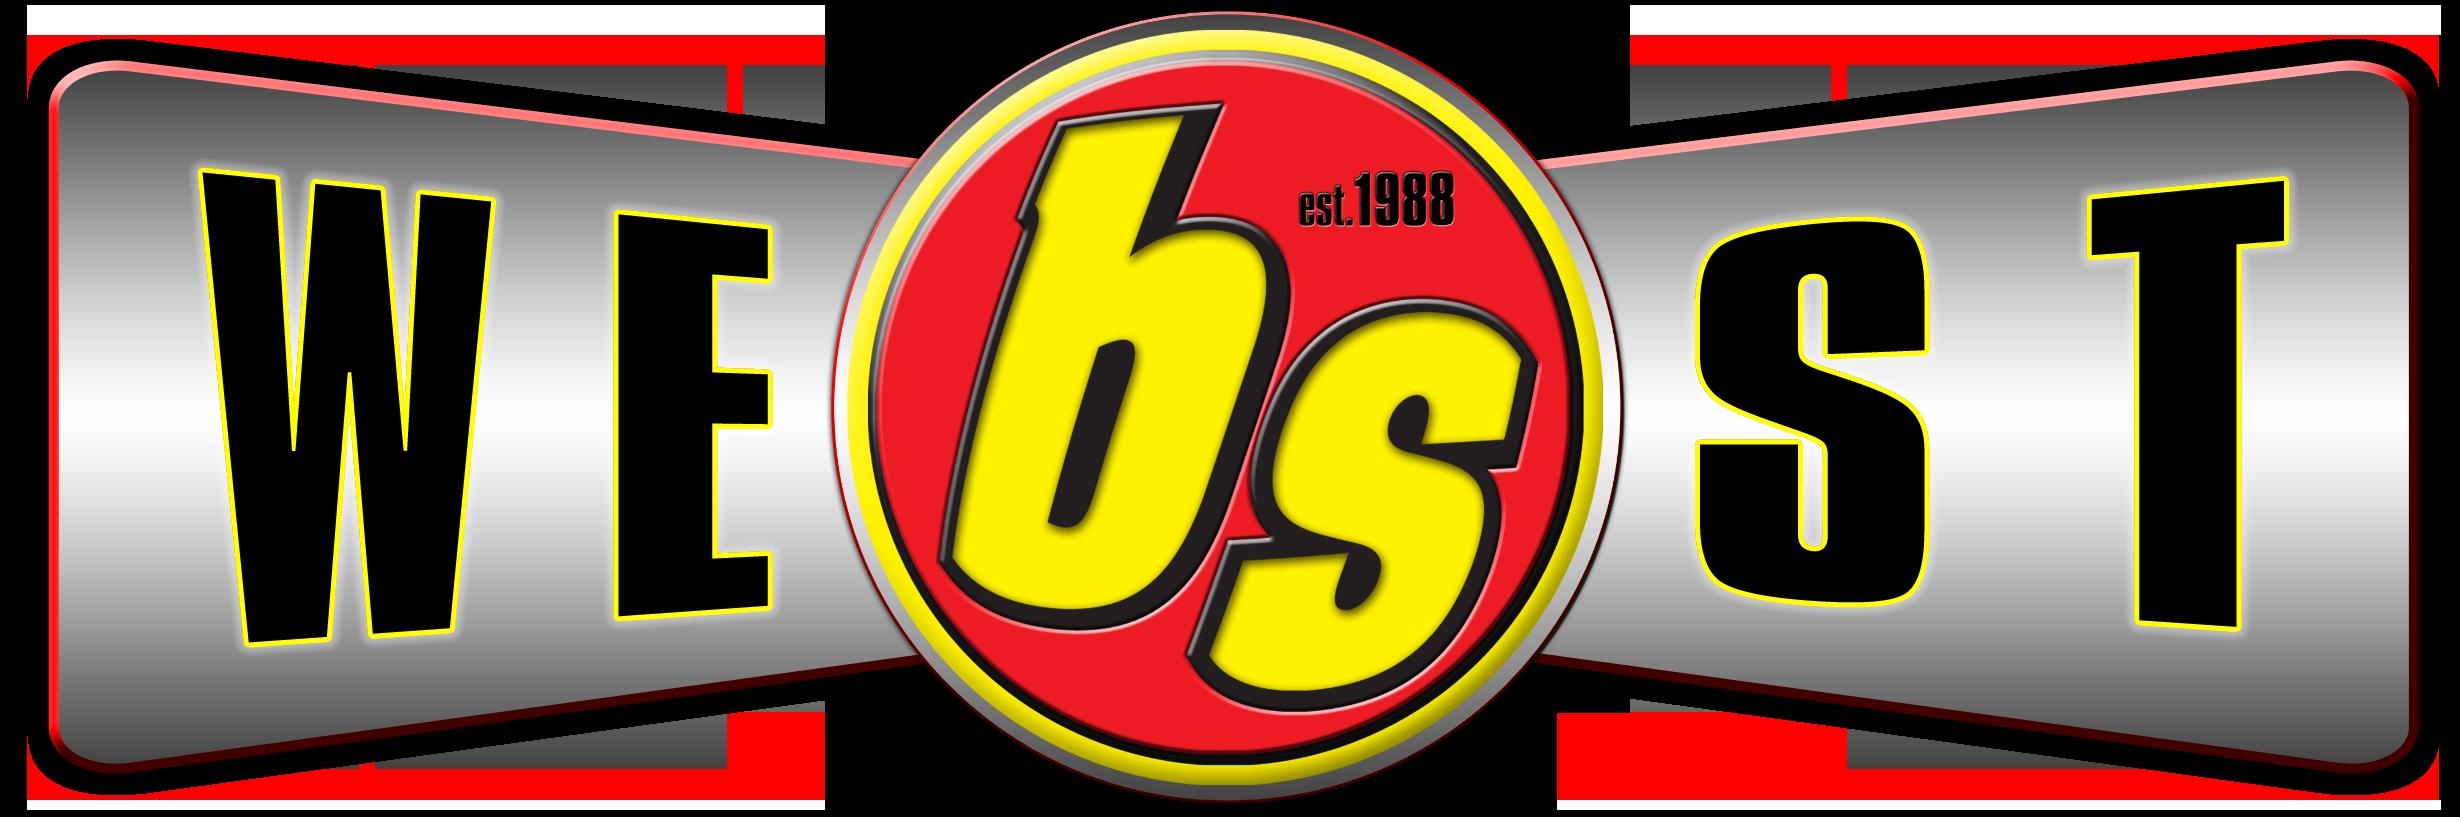 bs-west-logo